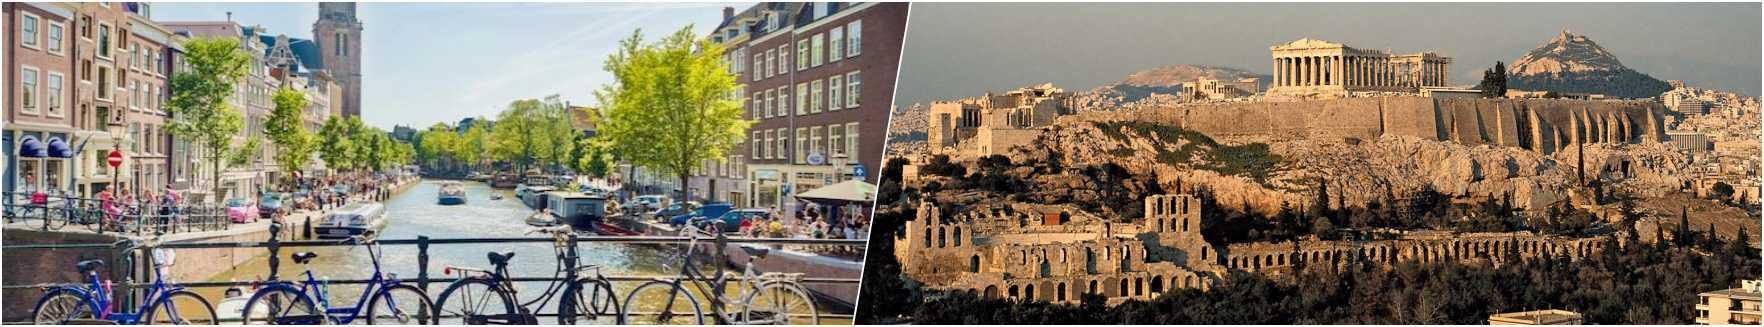 Amsterdam - Athens